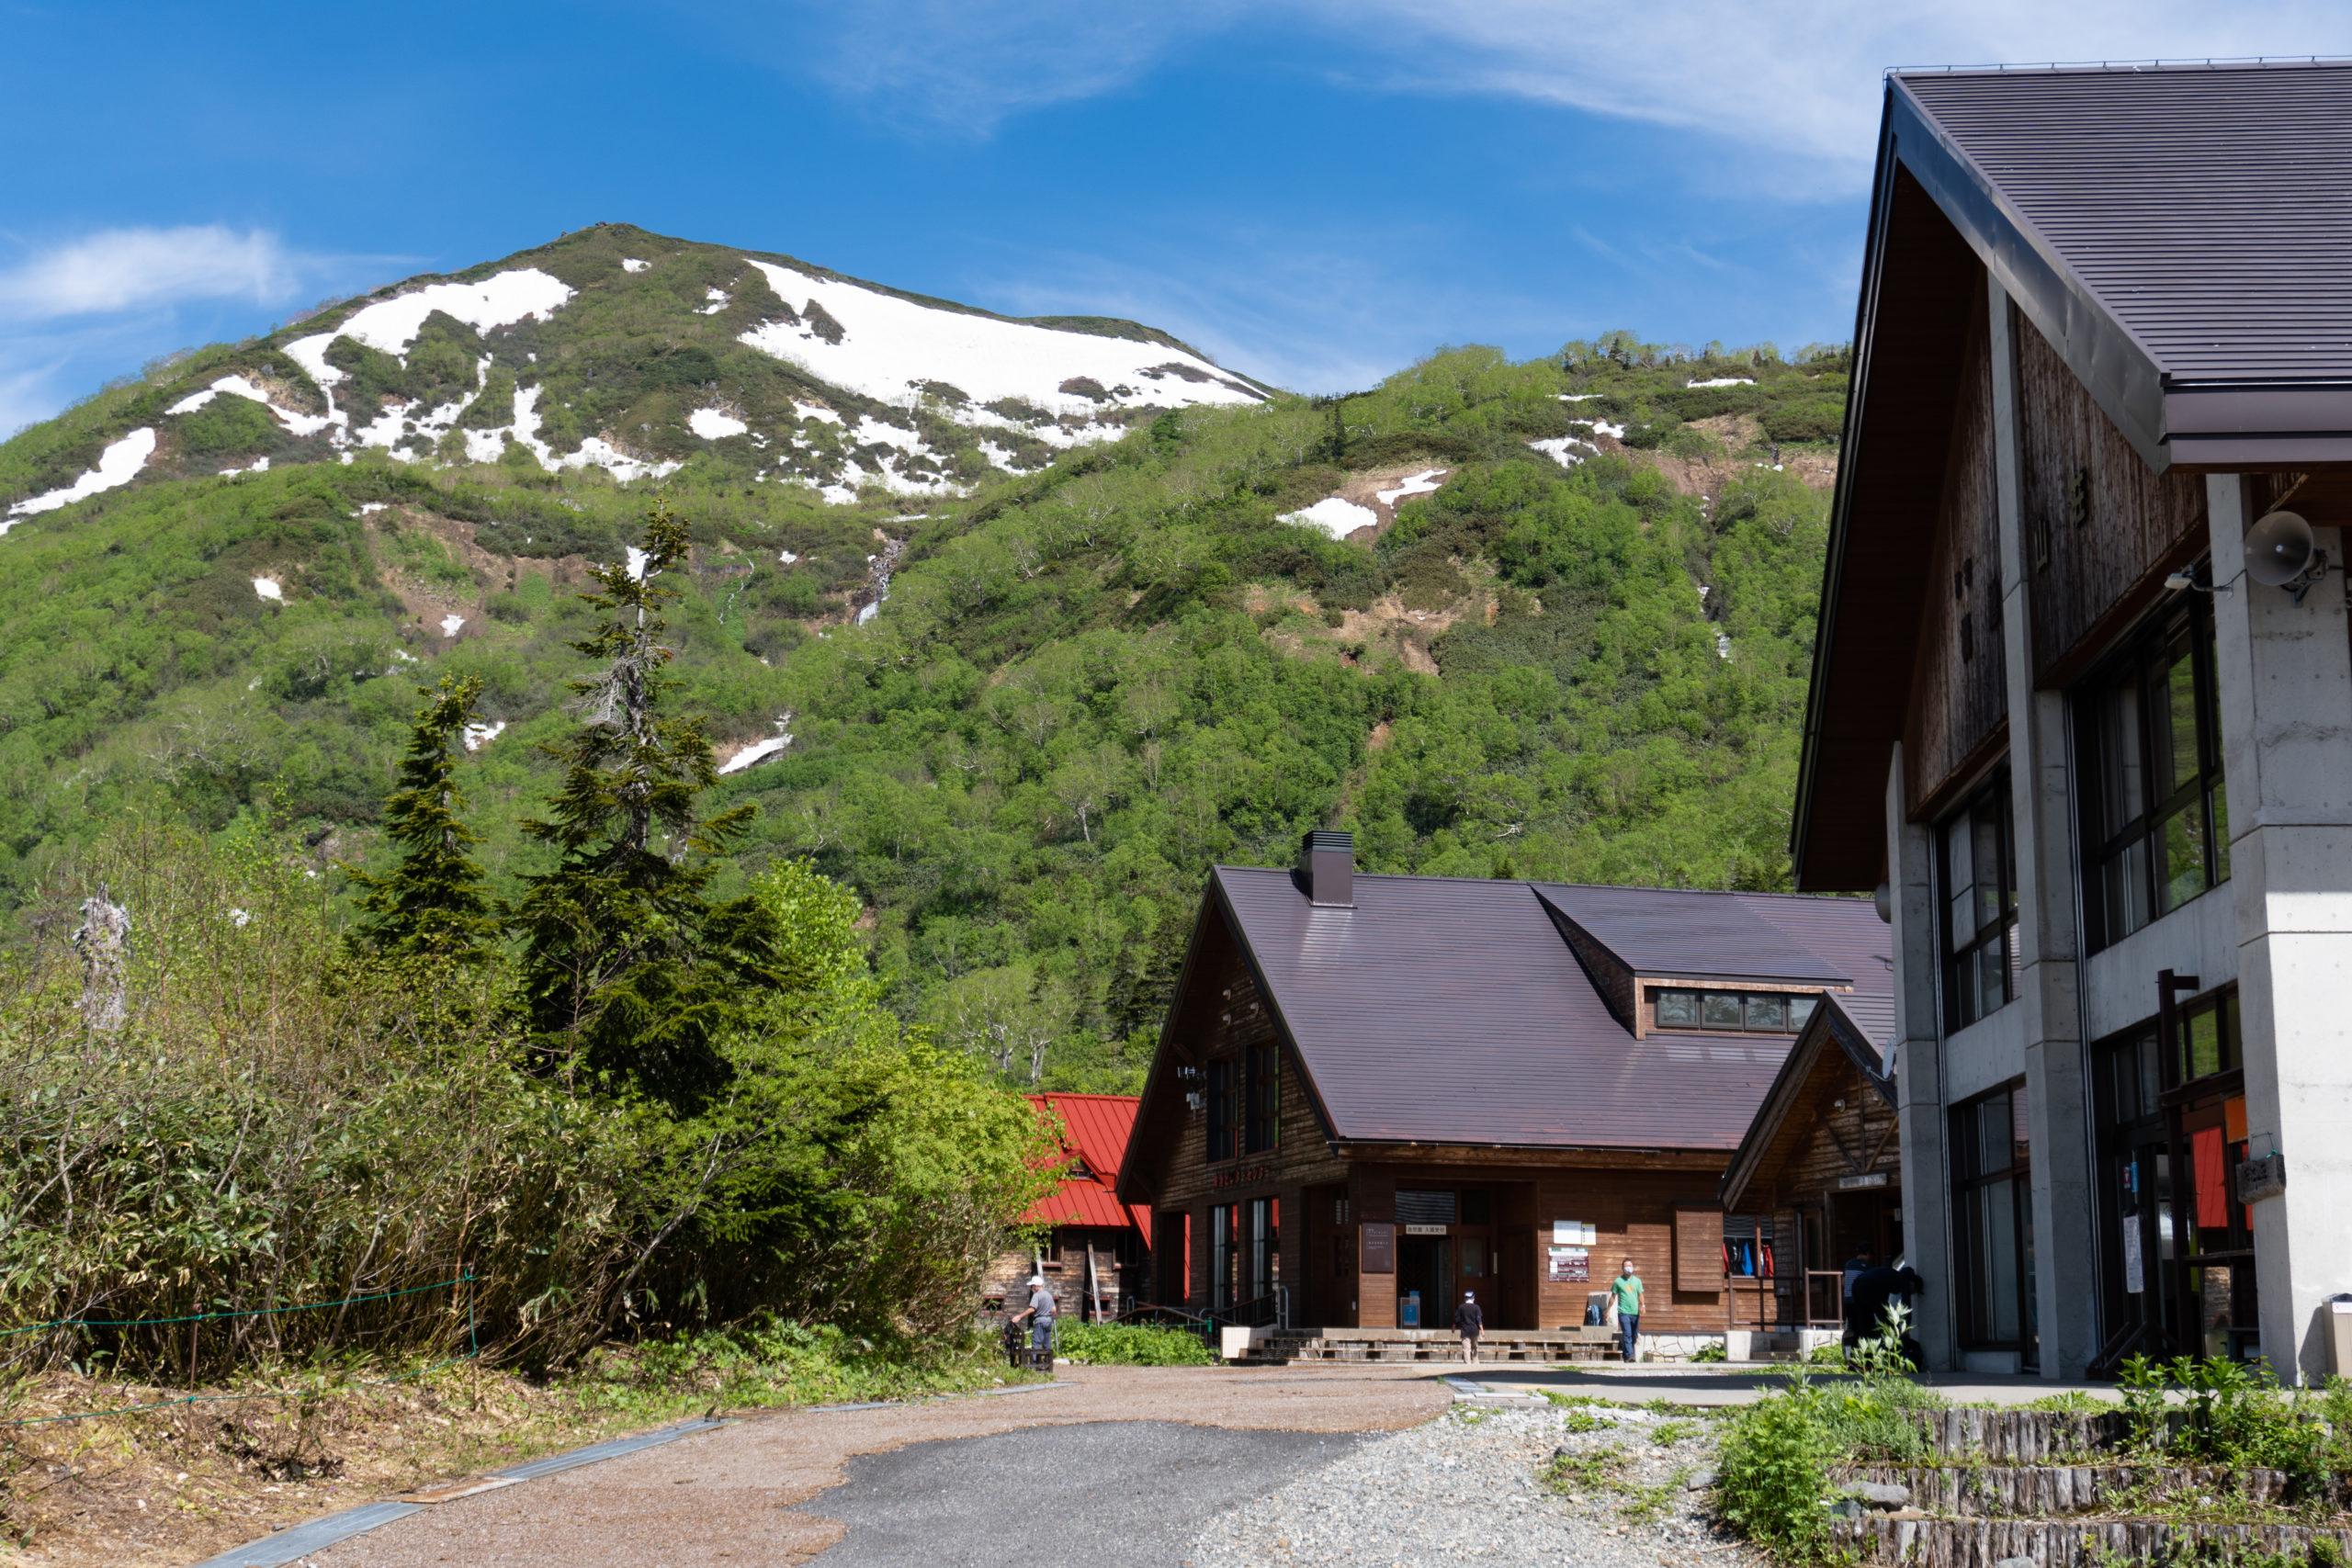 Tengo no Hara Hike - Tsugaike Hiking June 17th (10 of 40)